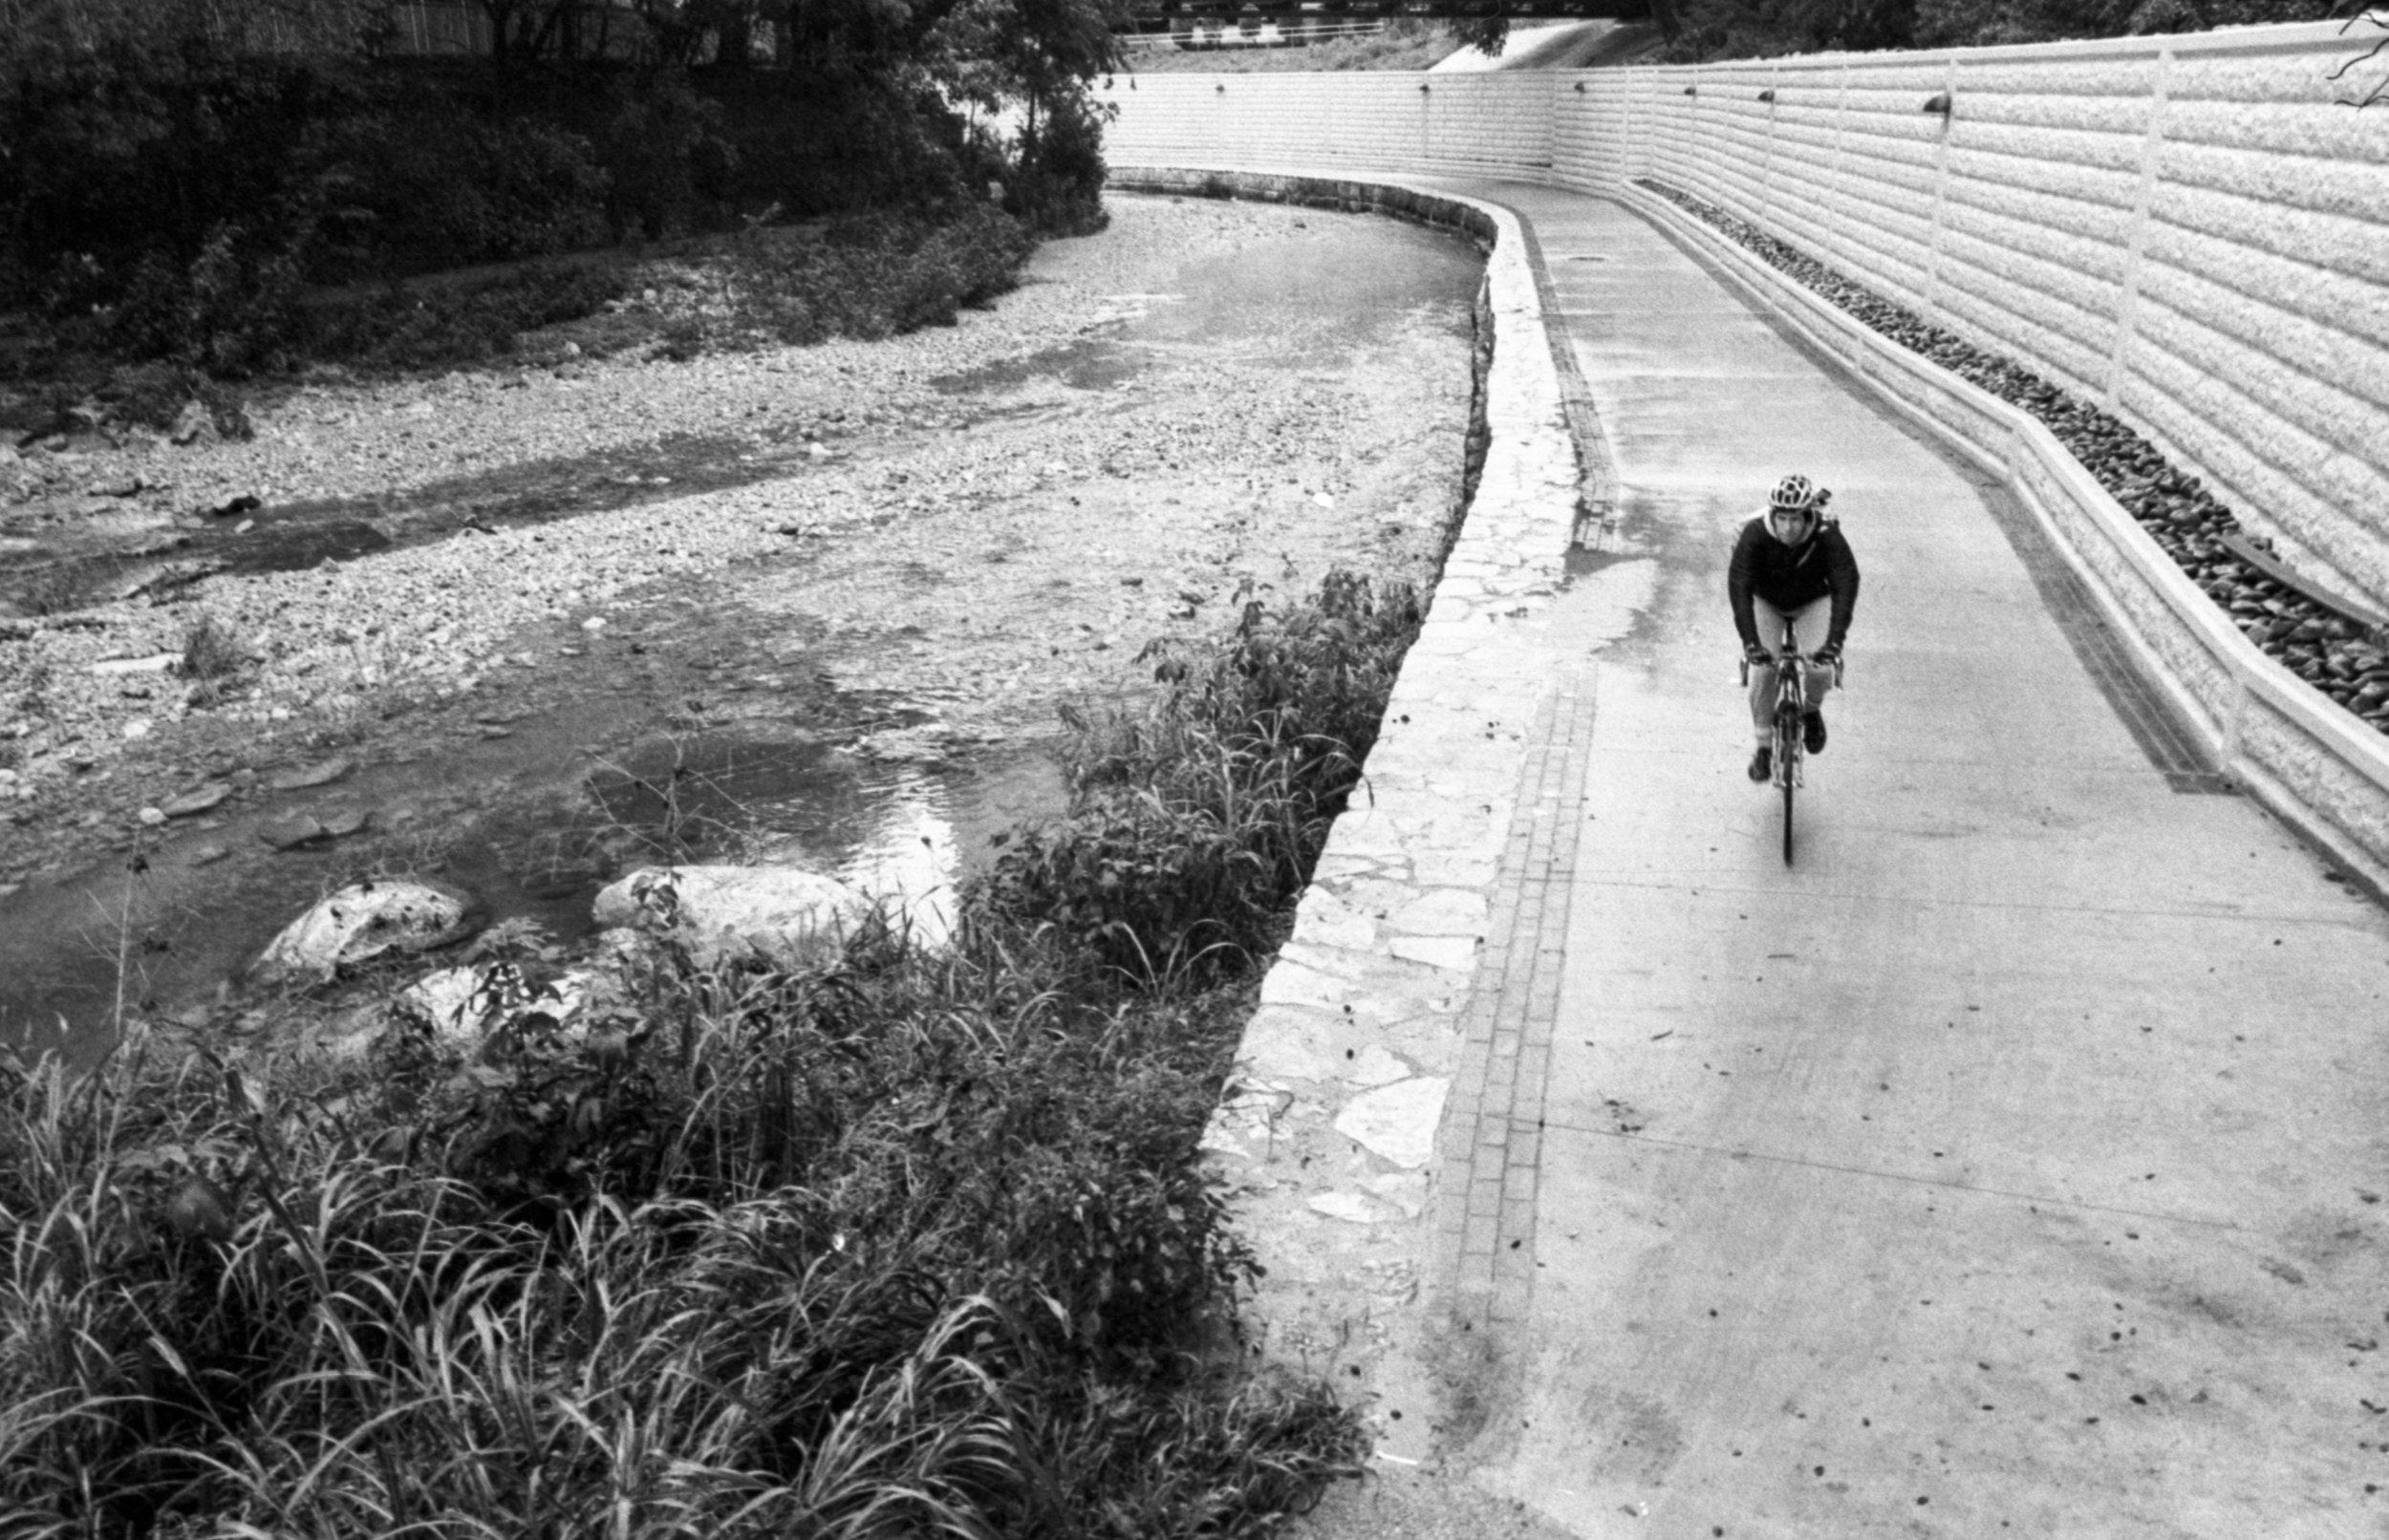 A cyclist bikes towards the camera at a river path in Austin, TX.